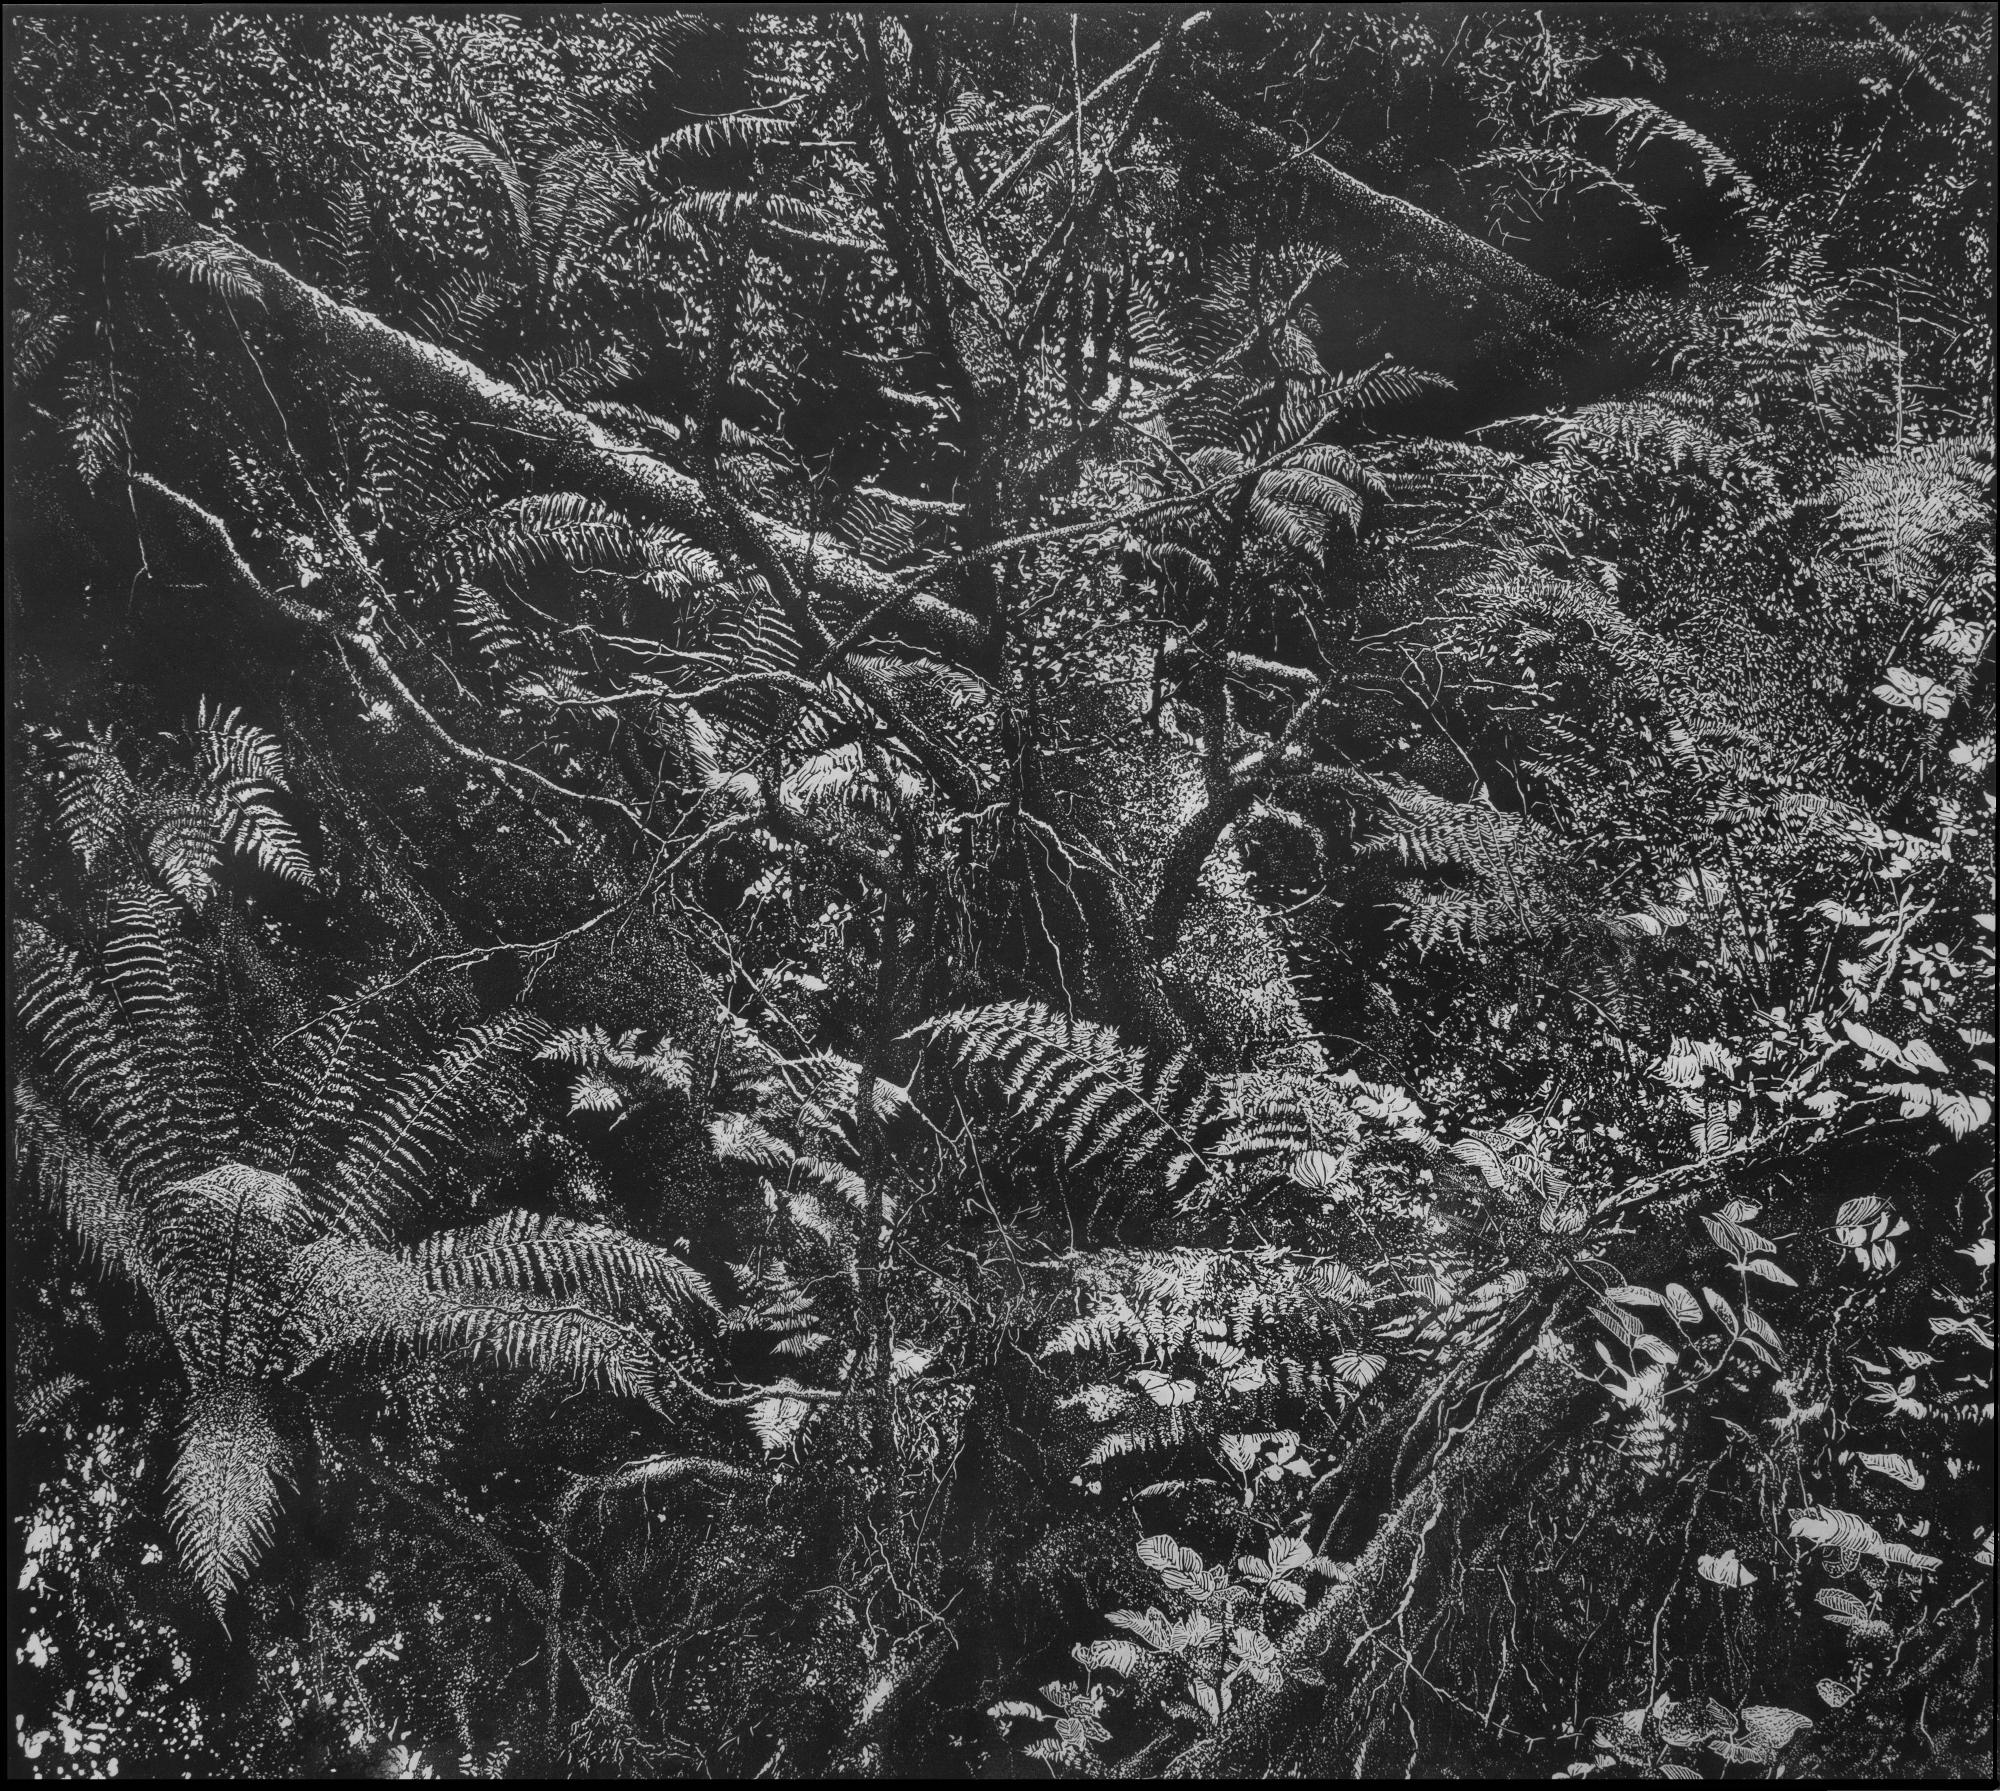 Georges Wenger, Lydford Gorge Forest I, 2016, Copyright: Georges Wenger